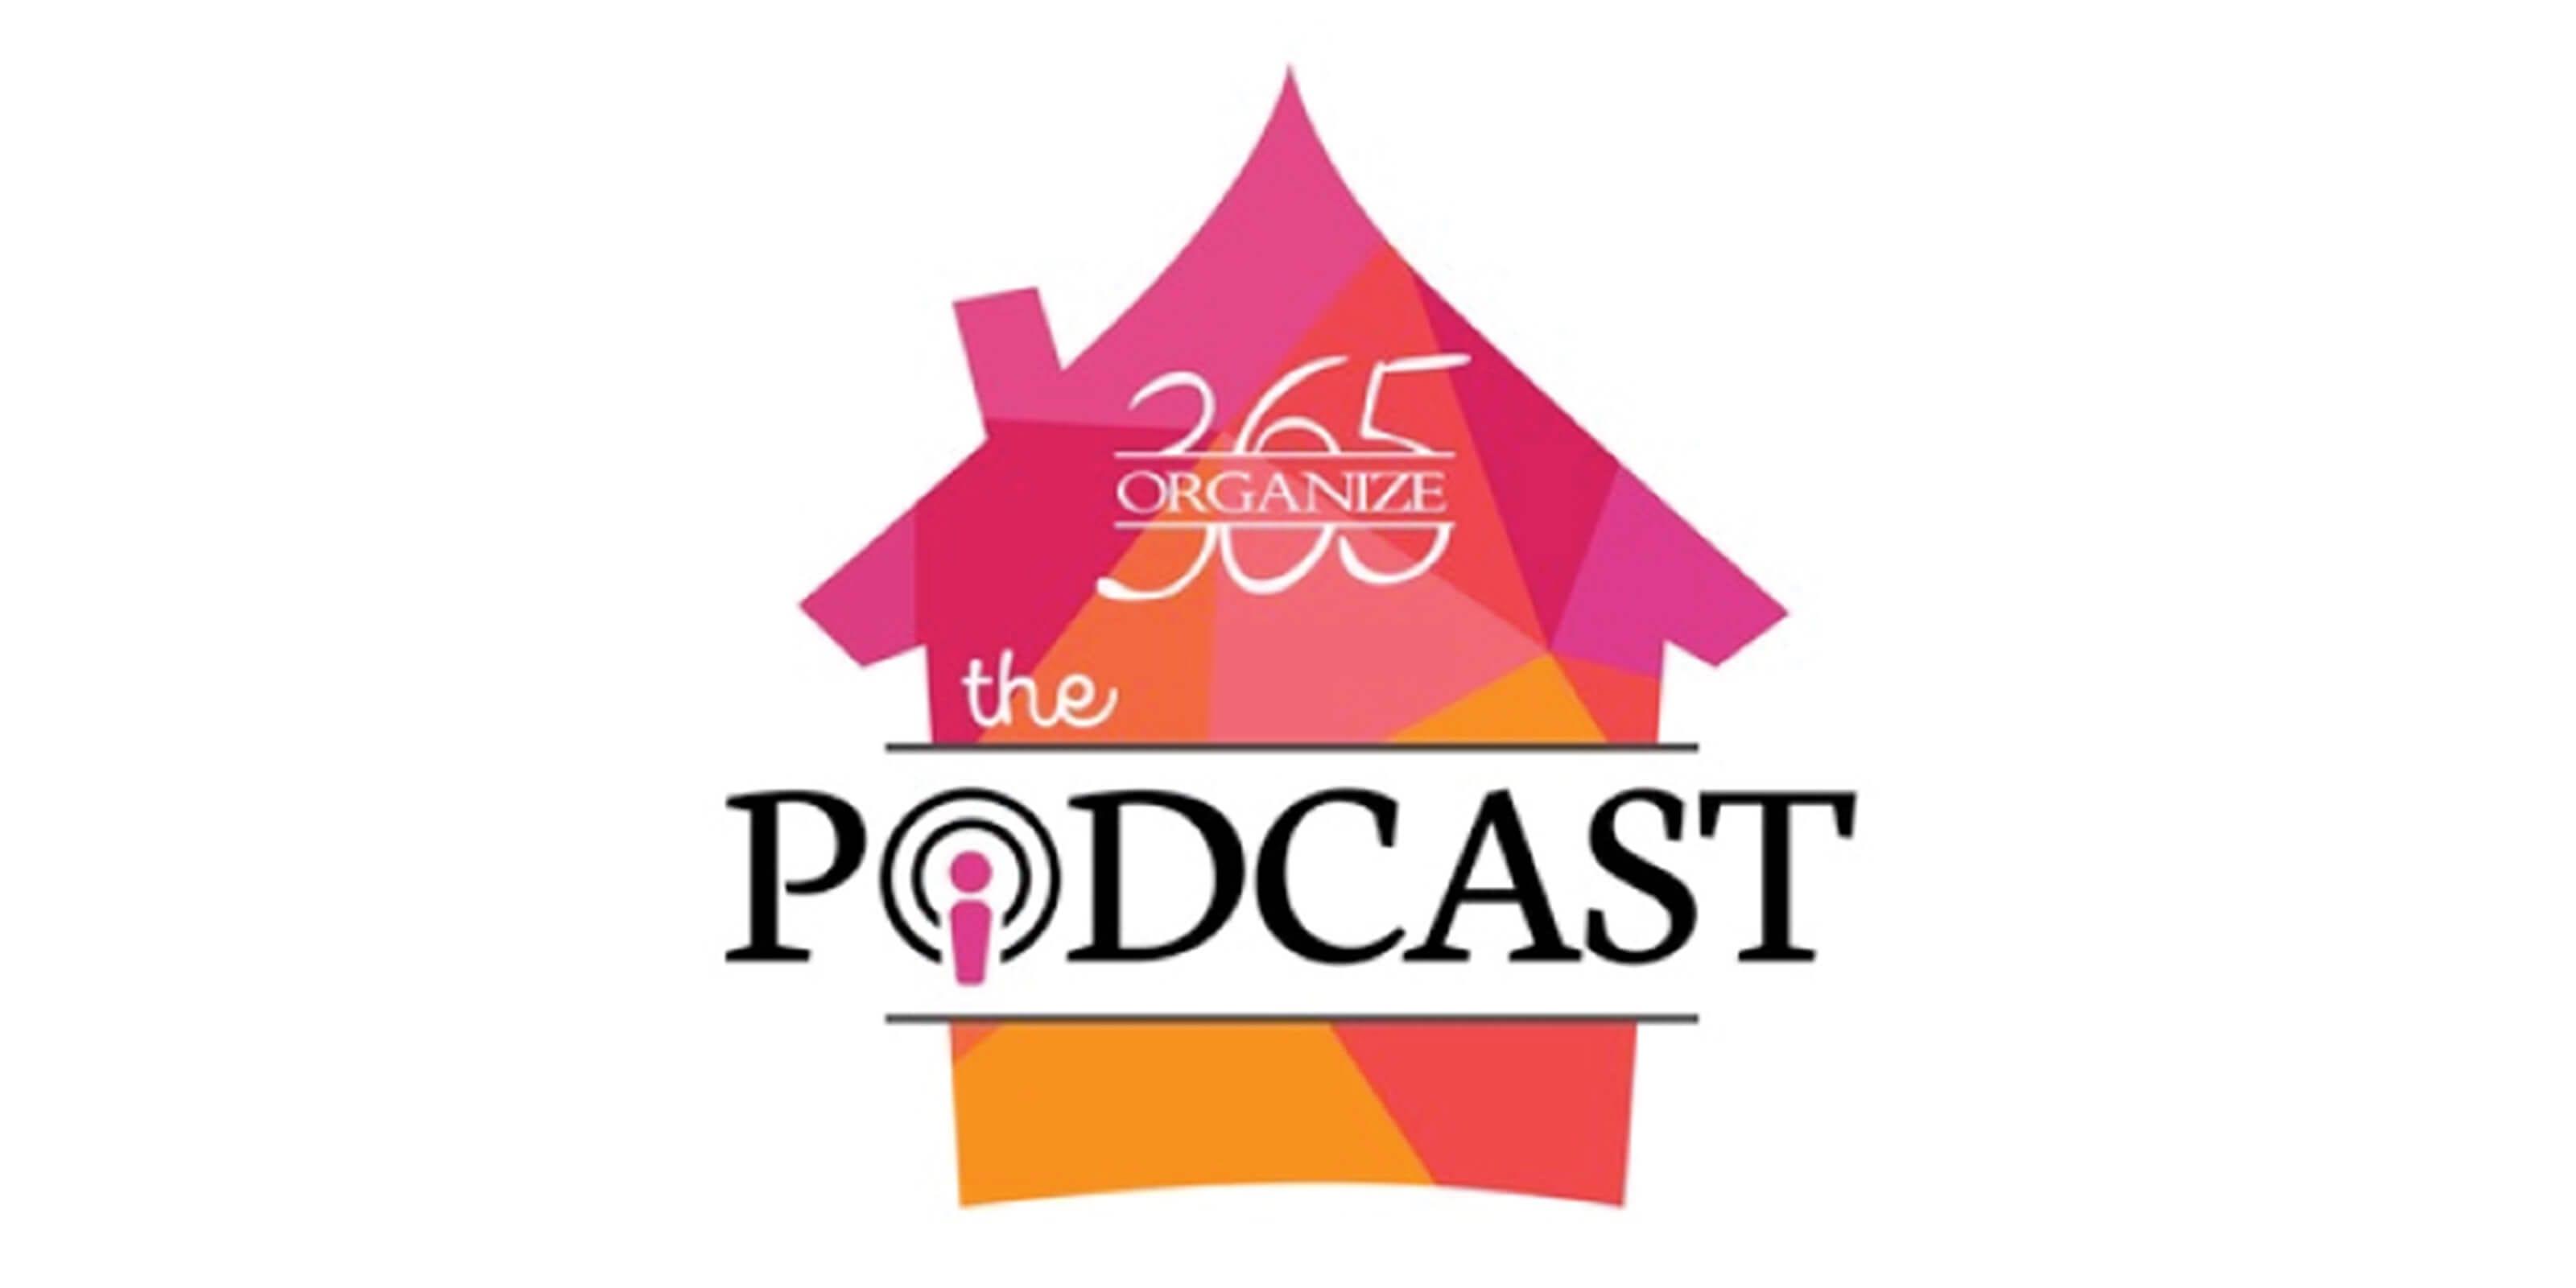 365 organize the podcast logo